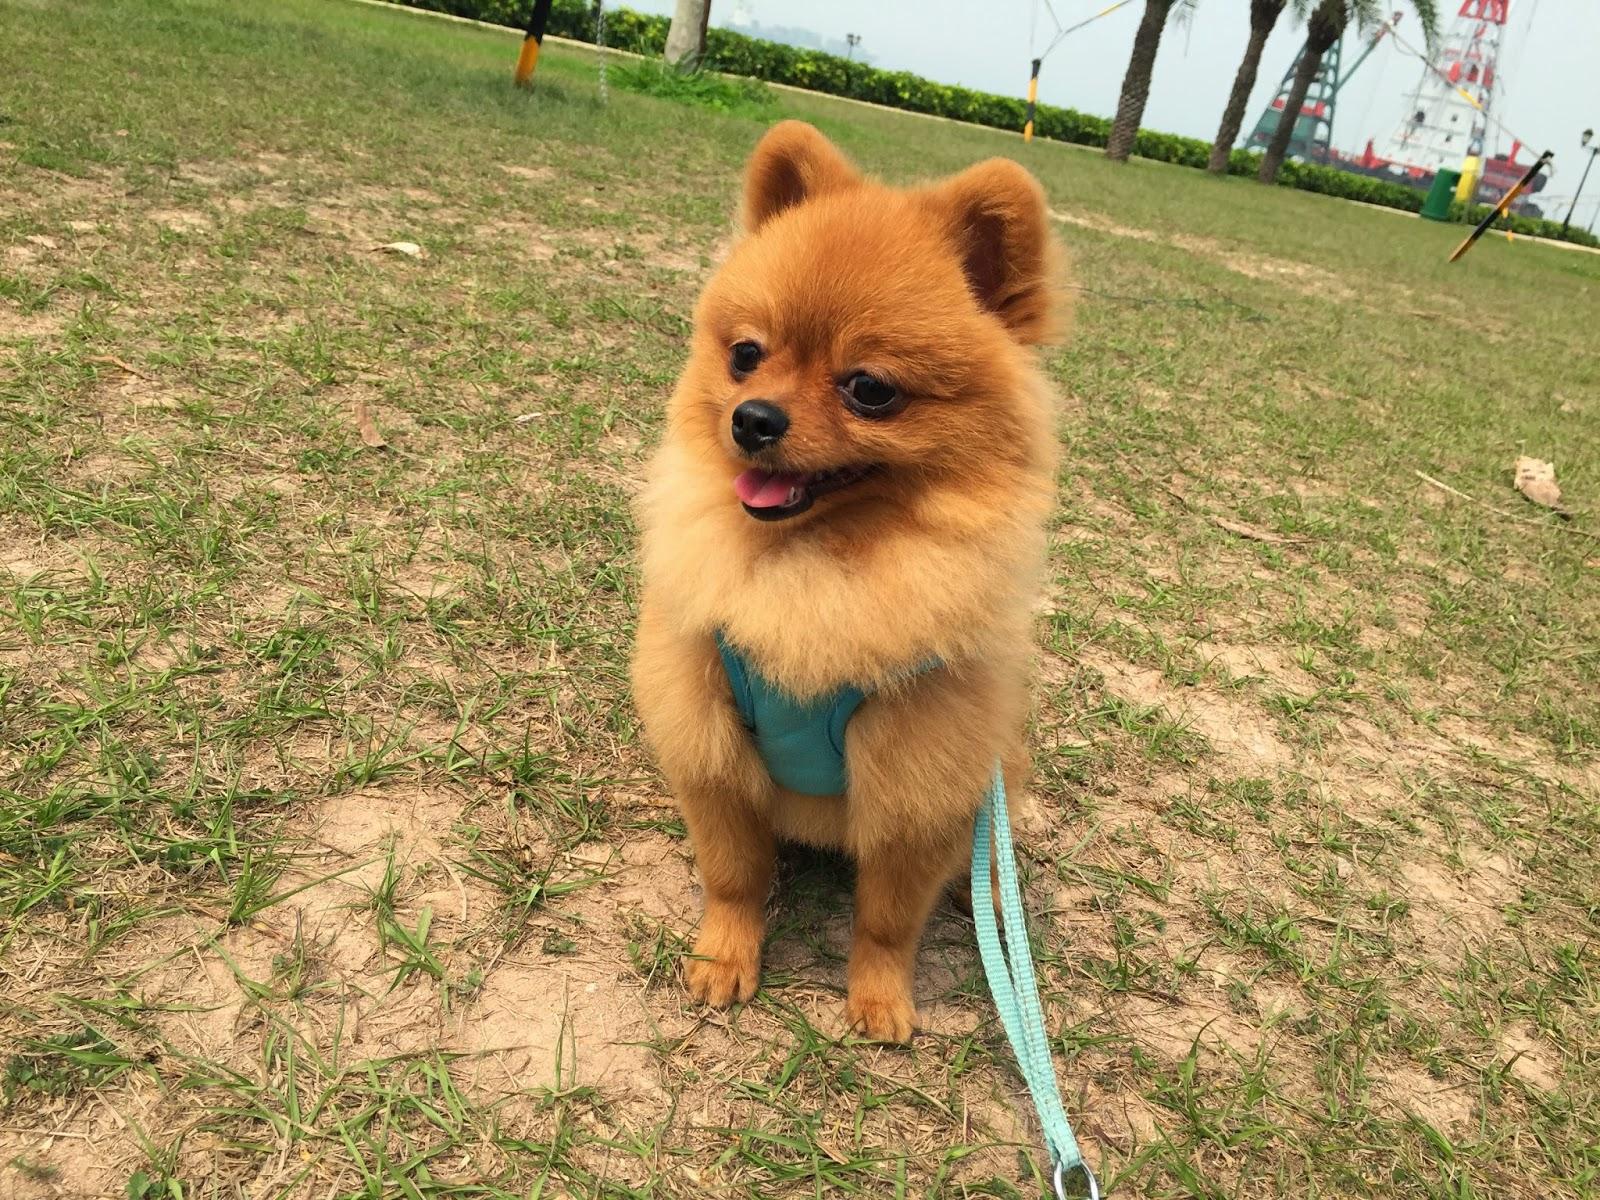 Pets Neverland 狗狗資訊站: 狗狗好去處-港島: 數碼港海濱公園